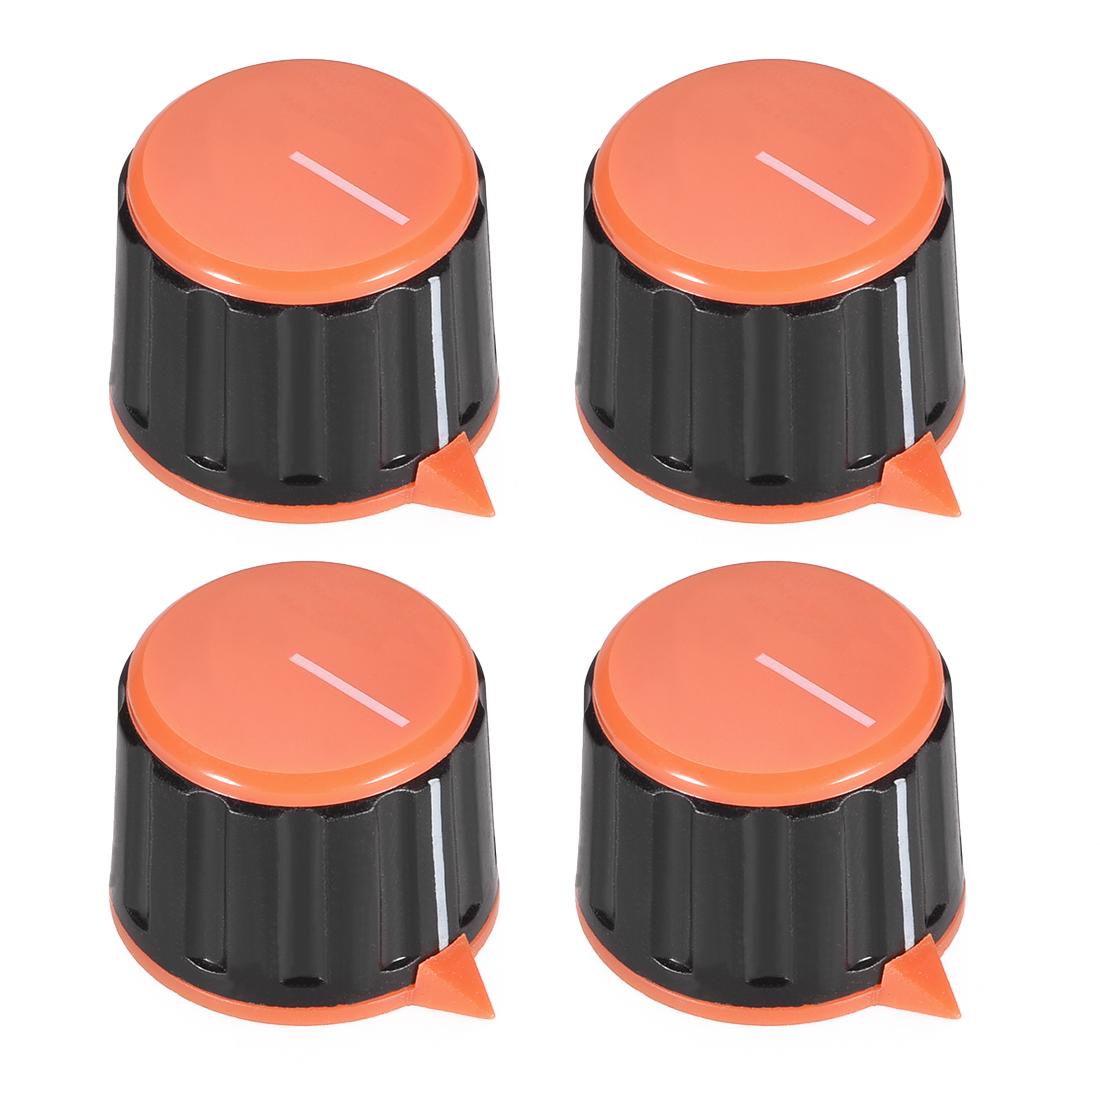 4pcs 6mm Potentiometer Control Knobs For Guitar Acrylic Volume Tone Knobs Orange